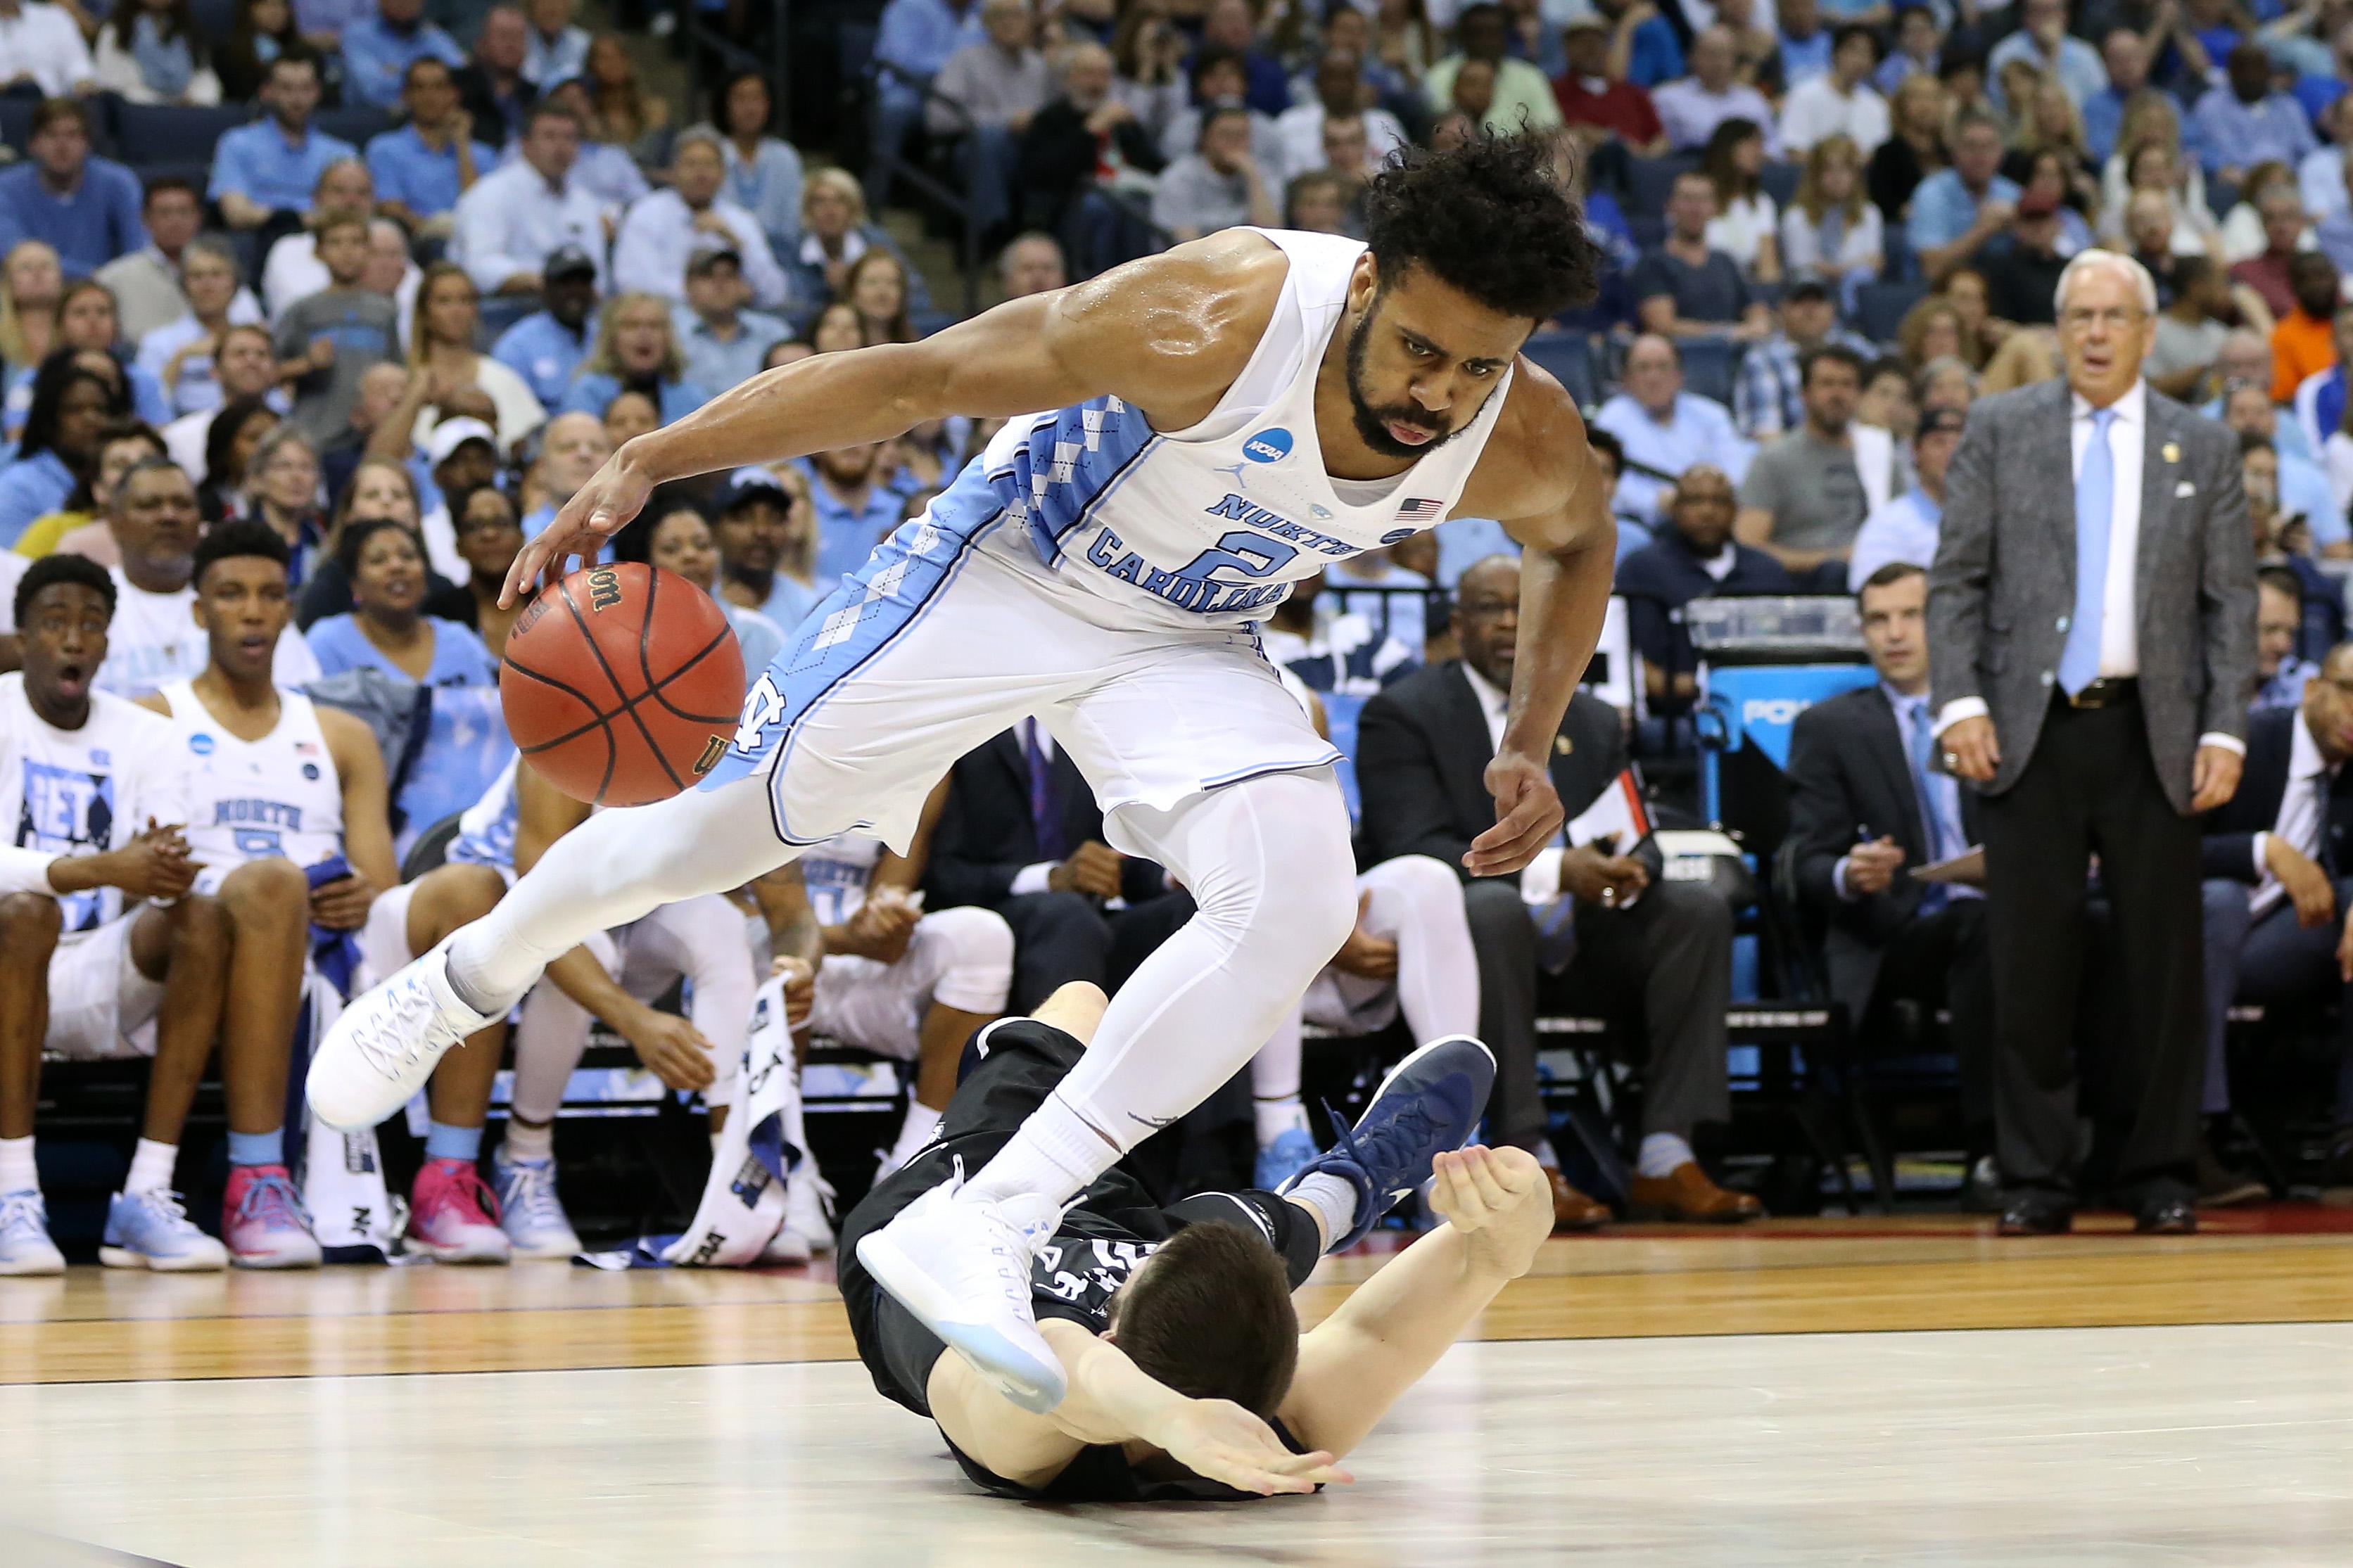 9968247-ncaa-basketball-ncaa-tournament-south-regional-north-carolina-vs-butler